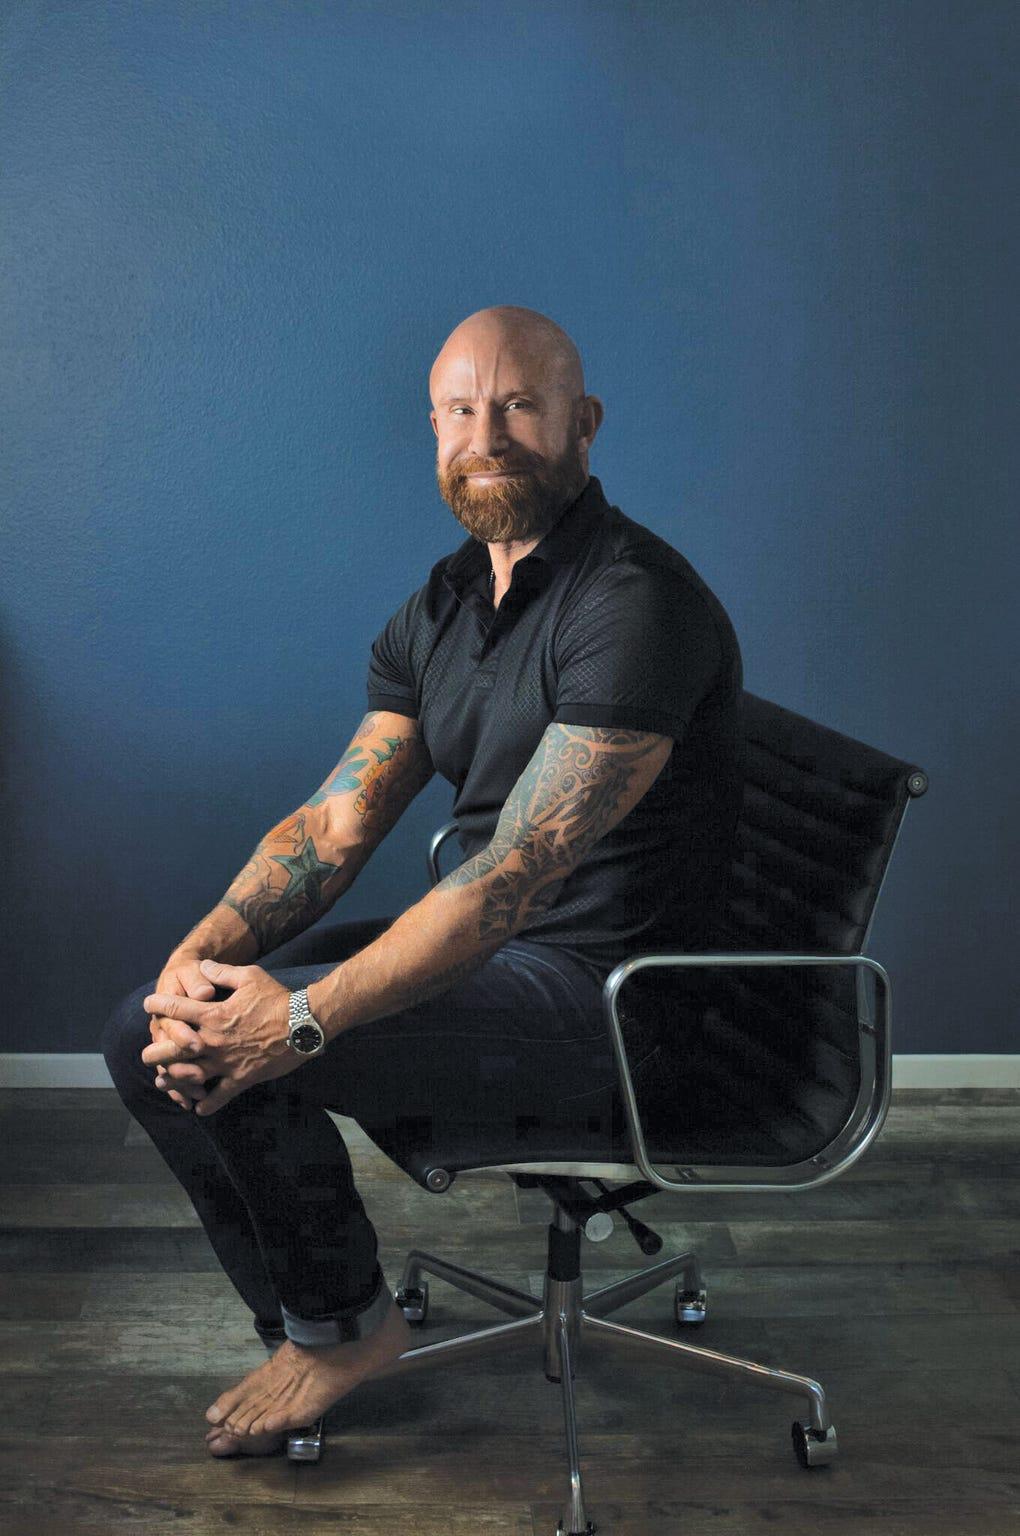 Best Interior Designer: Beau Stinnette